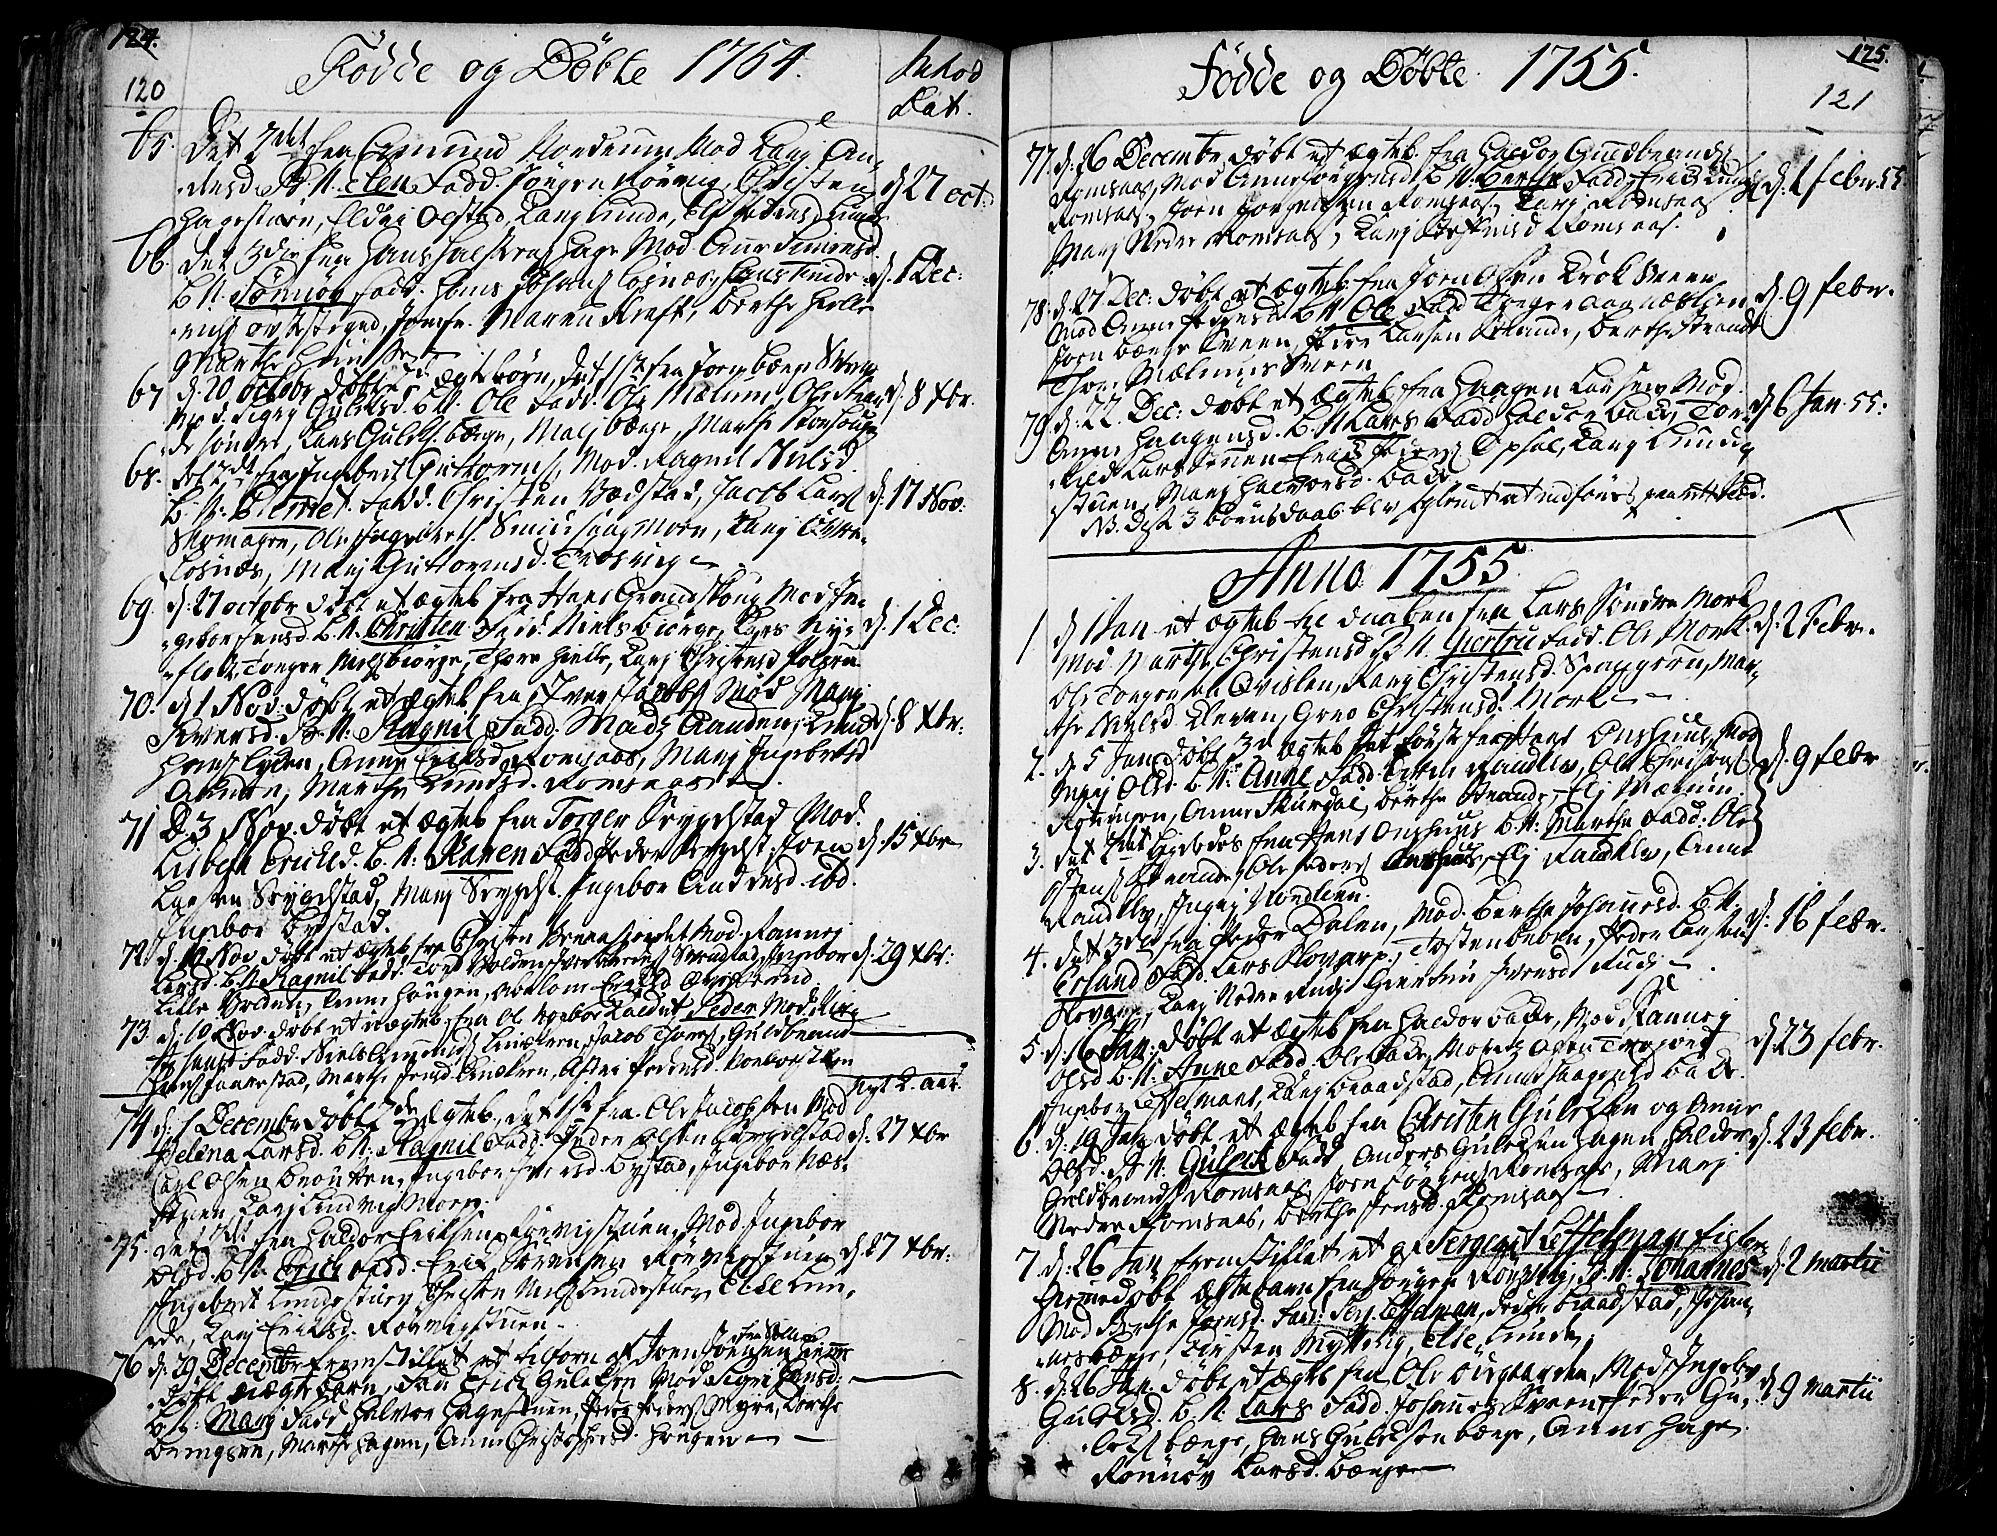 SAH, Ringebu prestekontor, Ministerialbok nr. 2, 1734-1780, s. 120-121